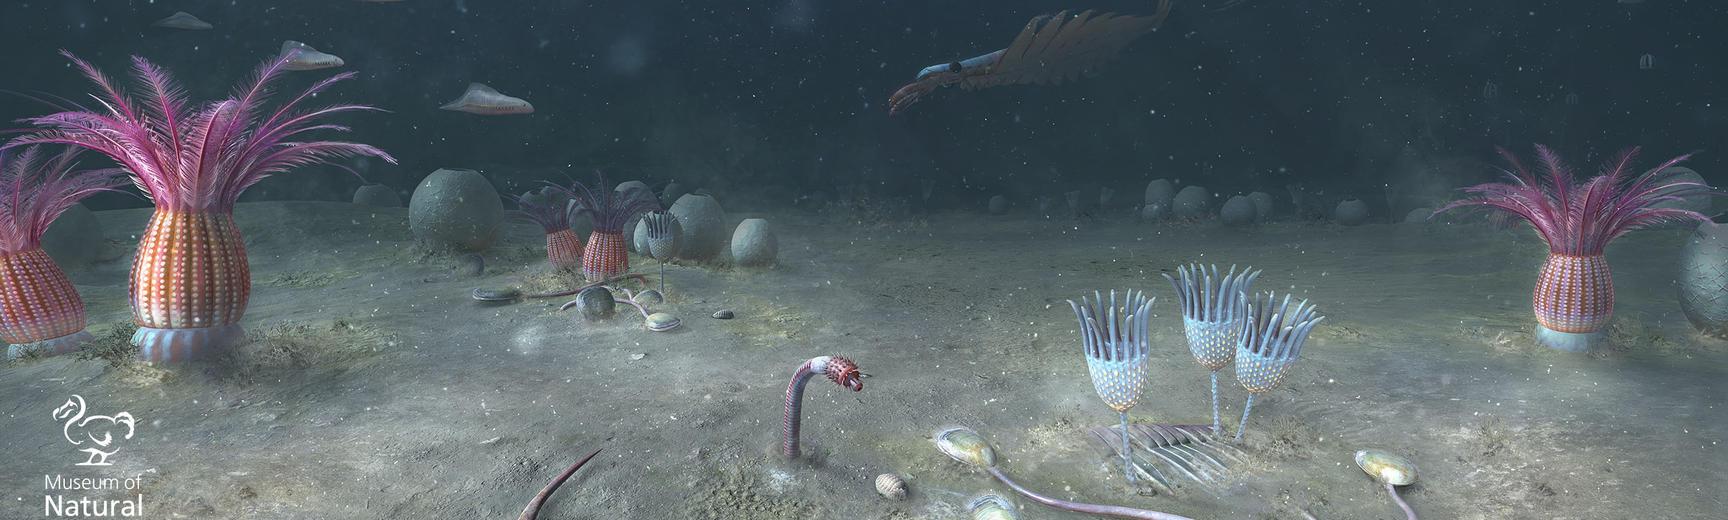 Cambrian sea floor, Yunnan Province, China - 518 million years ago.